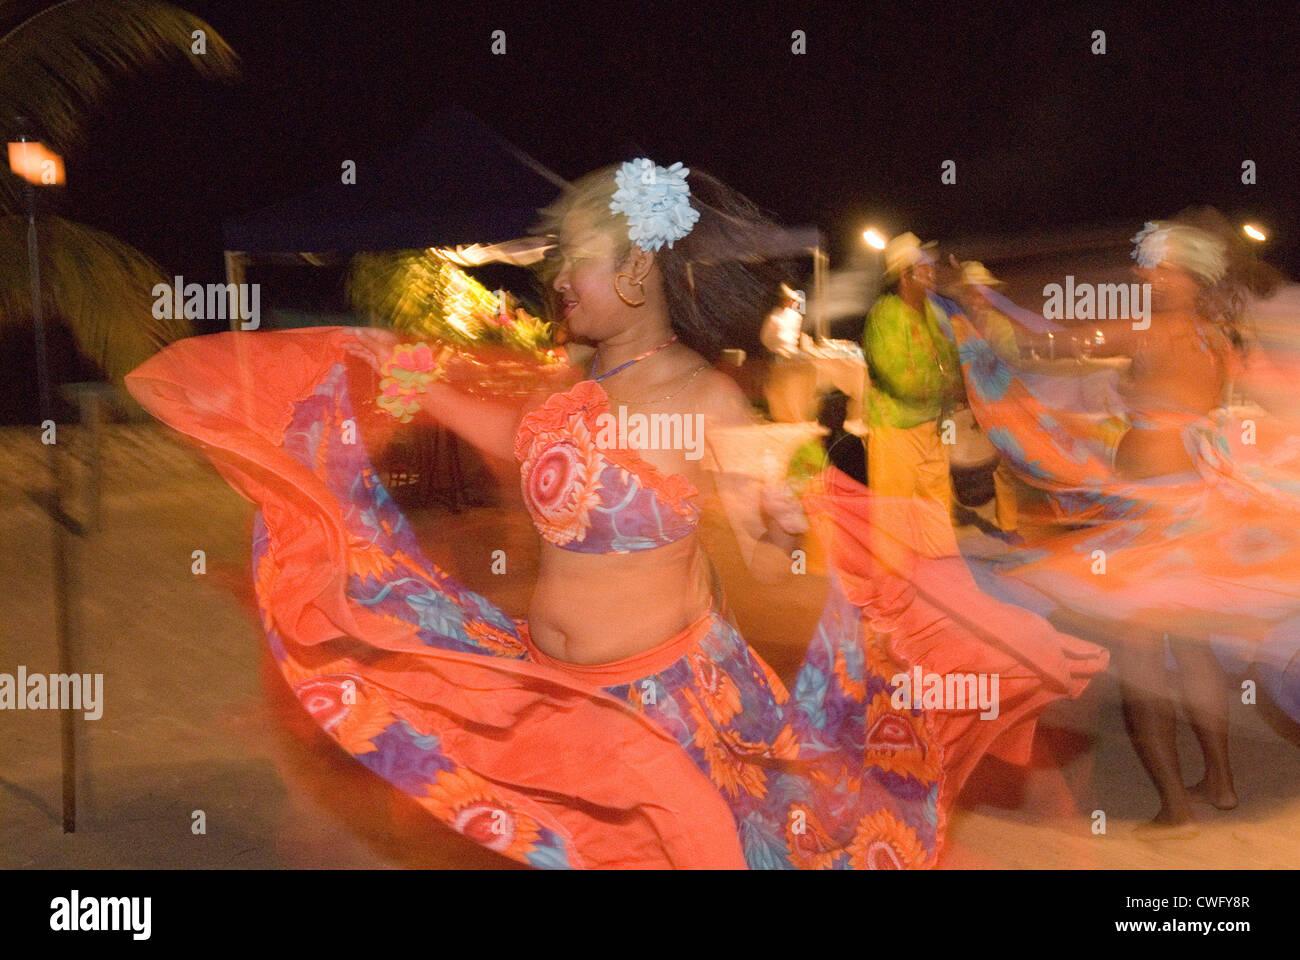 Grupo Folclórico en Mauricio Imagen De Stock